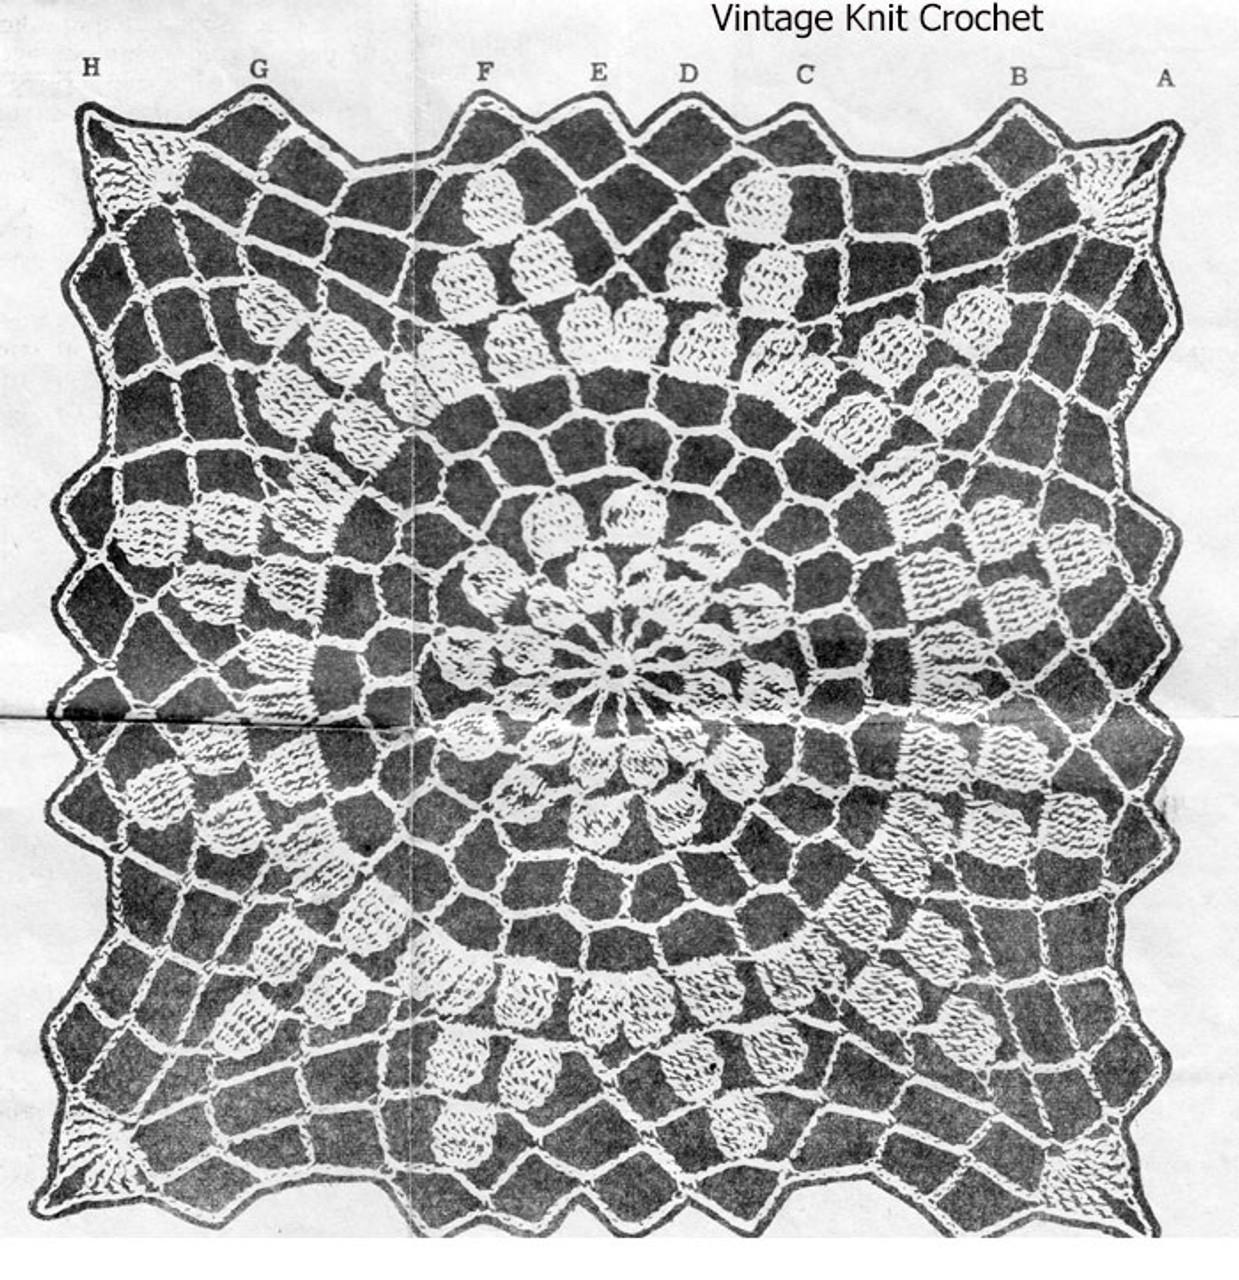 Crochet Square Pattern Stitch Illustration Design 7216